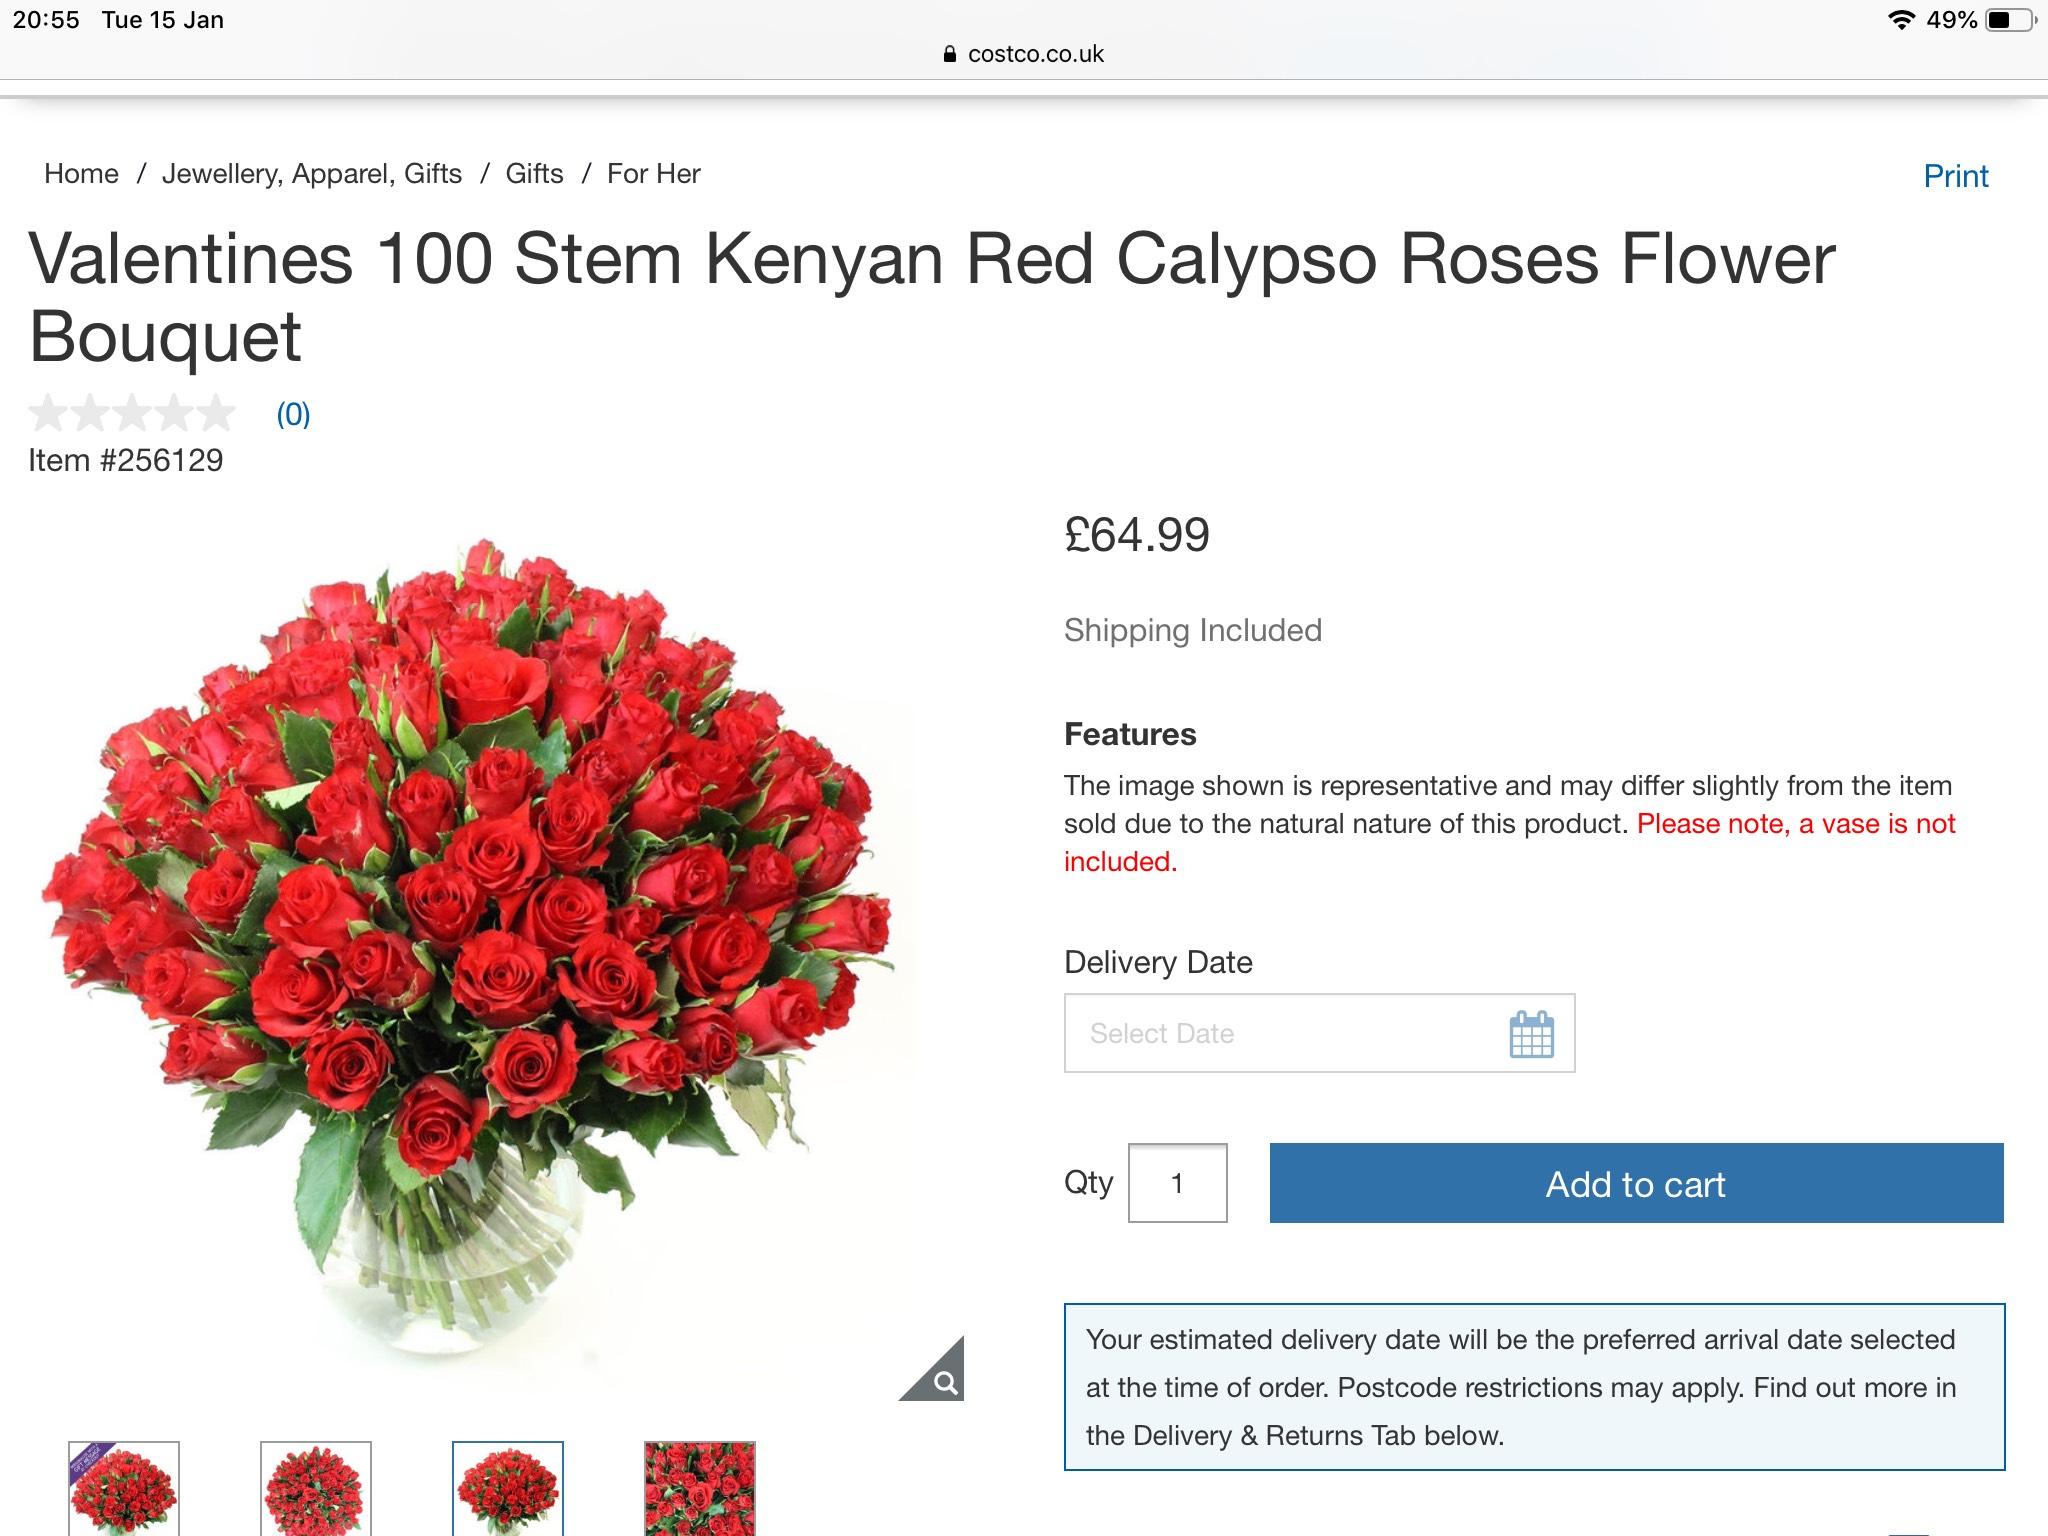 Valentines 100 Stem Kenyan Red Calypso Roses Flower Bouquet £64.99 @ Costco